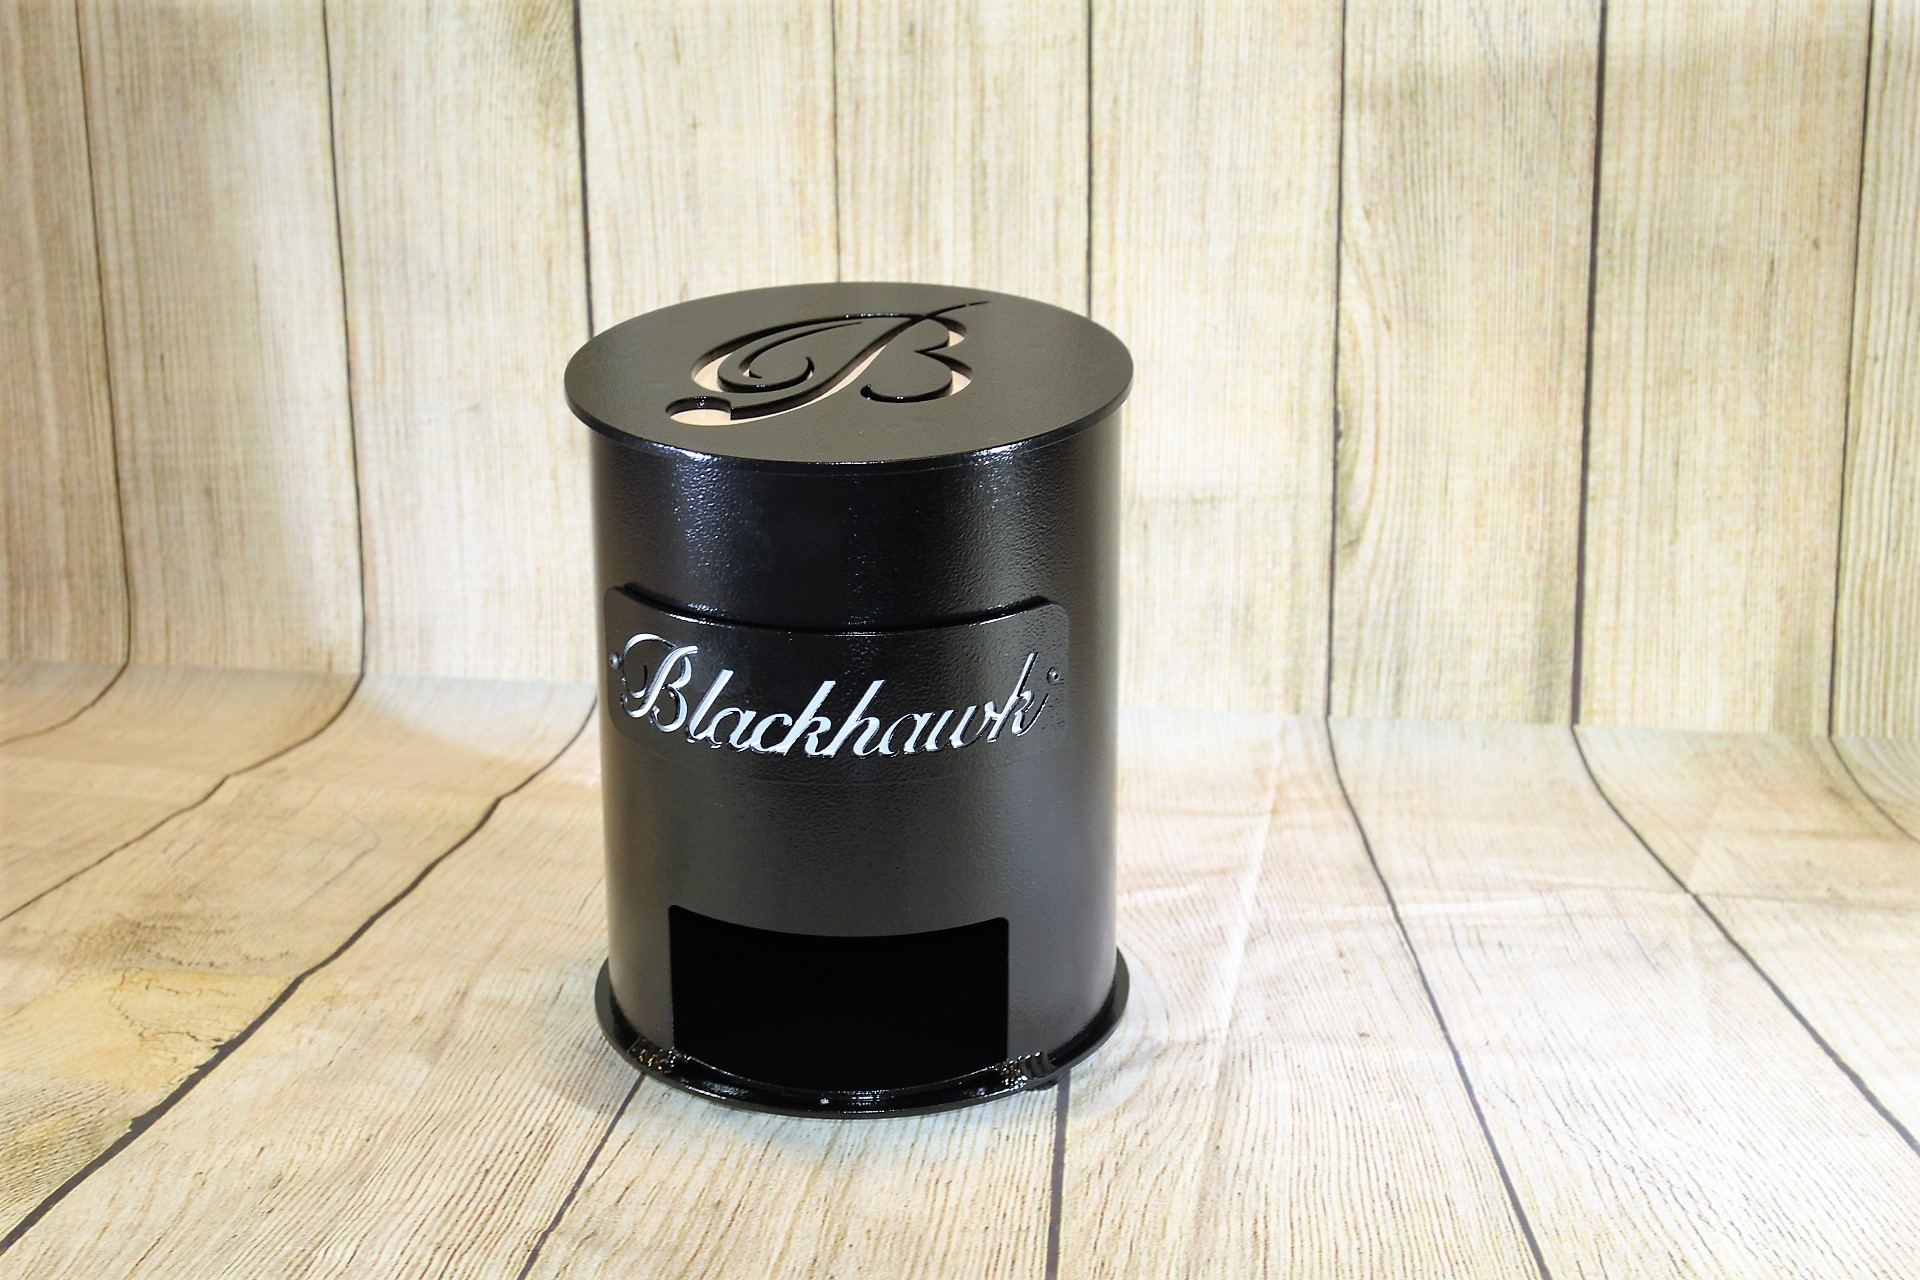 Ball-Container-Blackhawk-CC